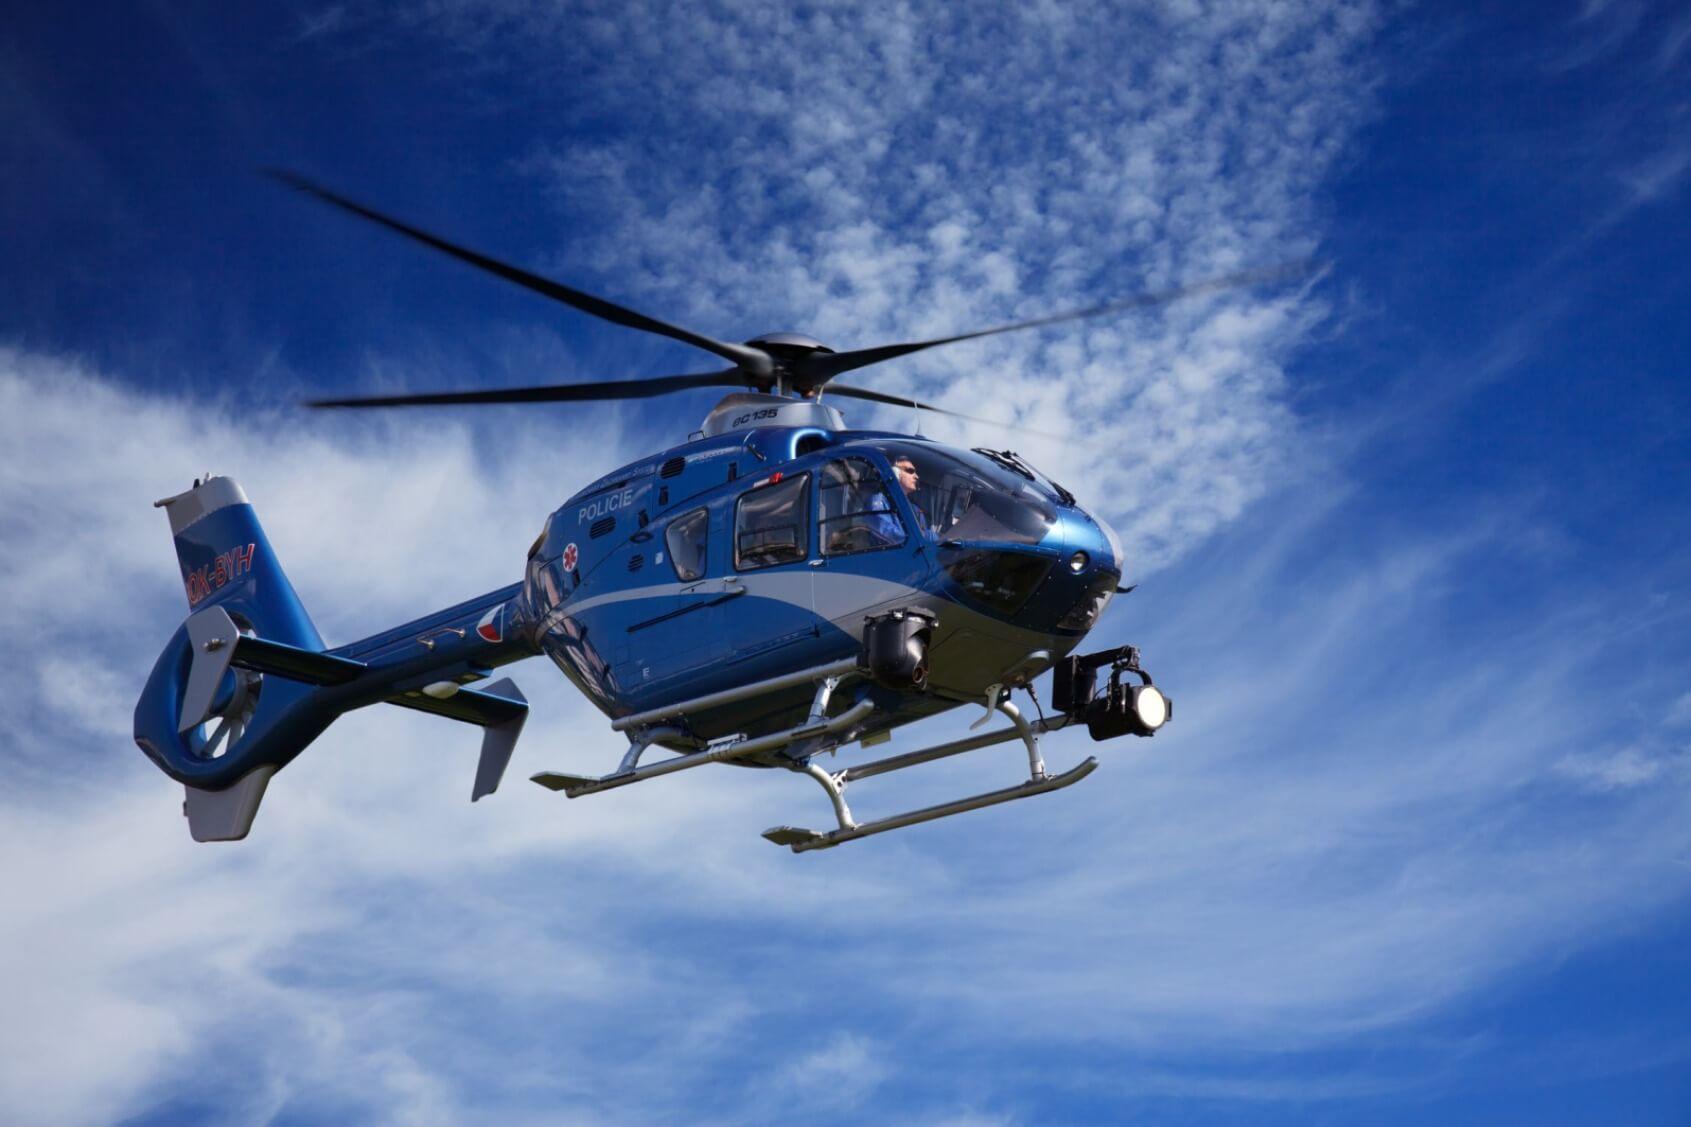 Helicopter - Original image